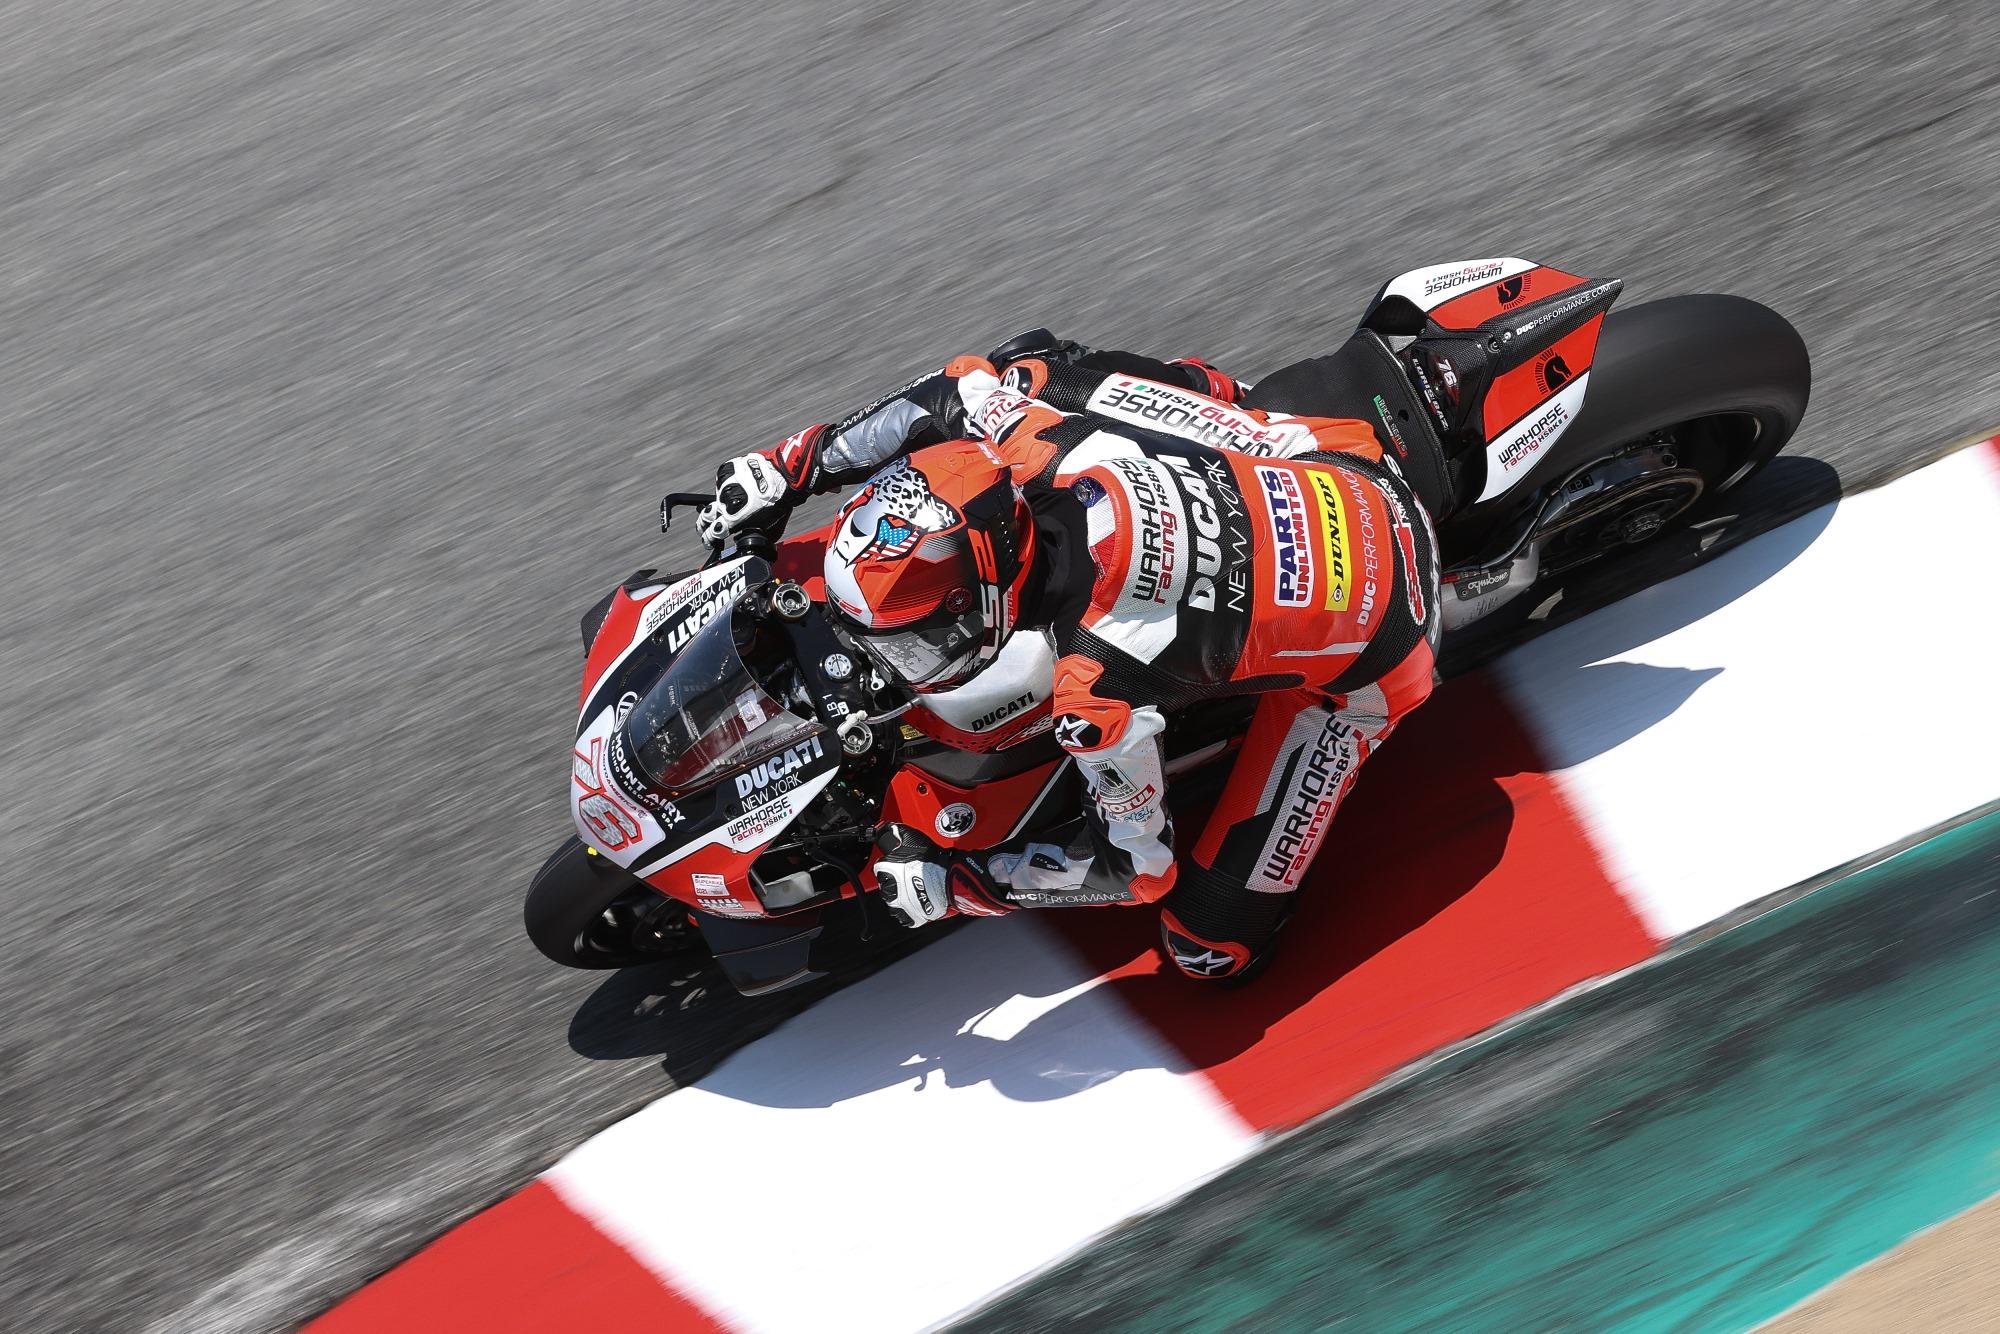 Warhorse HSBK Racing Ducati Team Claims 2-2 Finishes at Laguna Seca Superbike